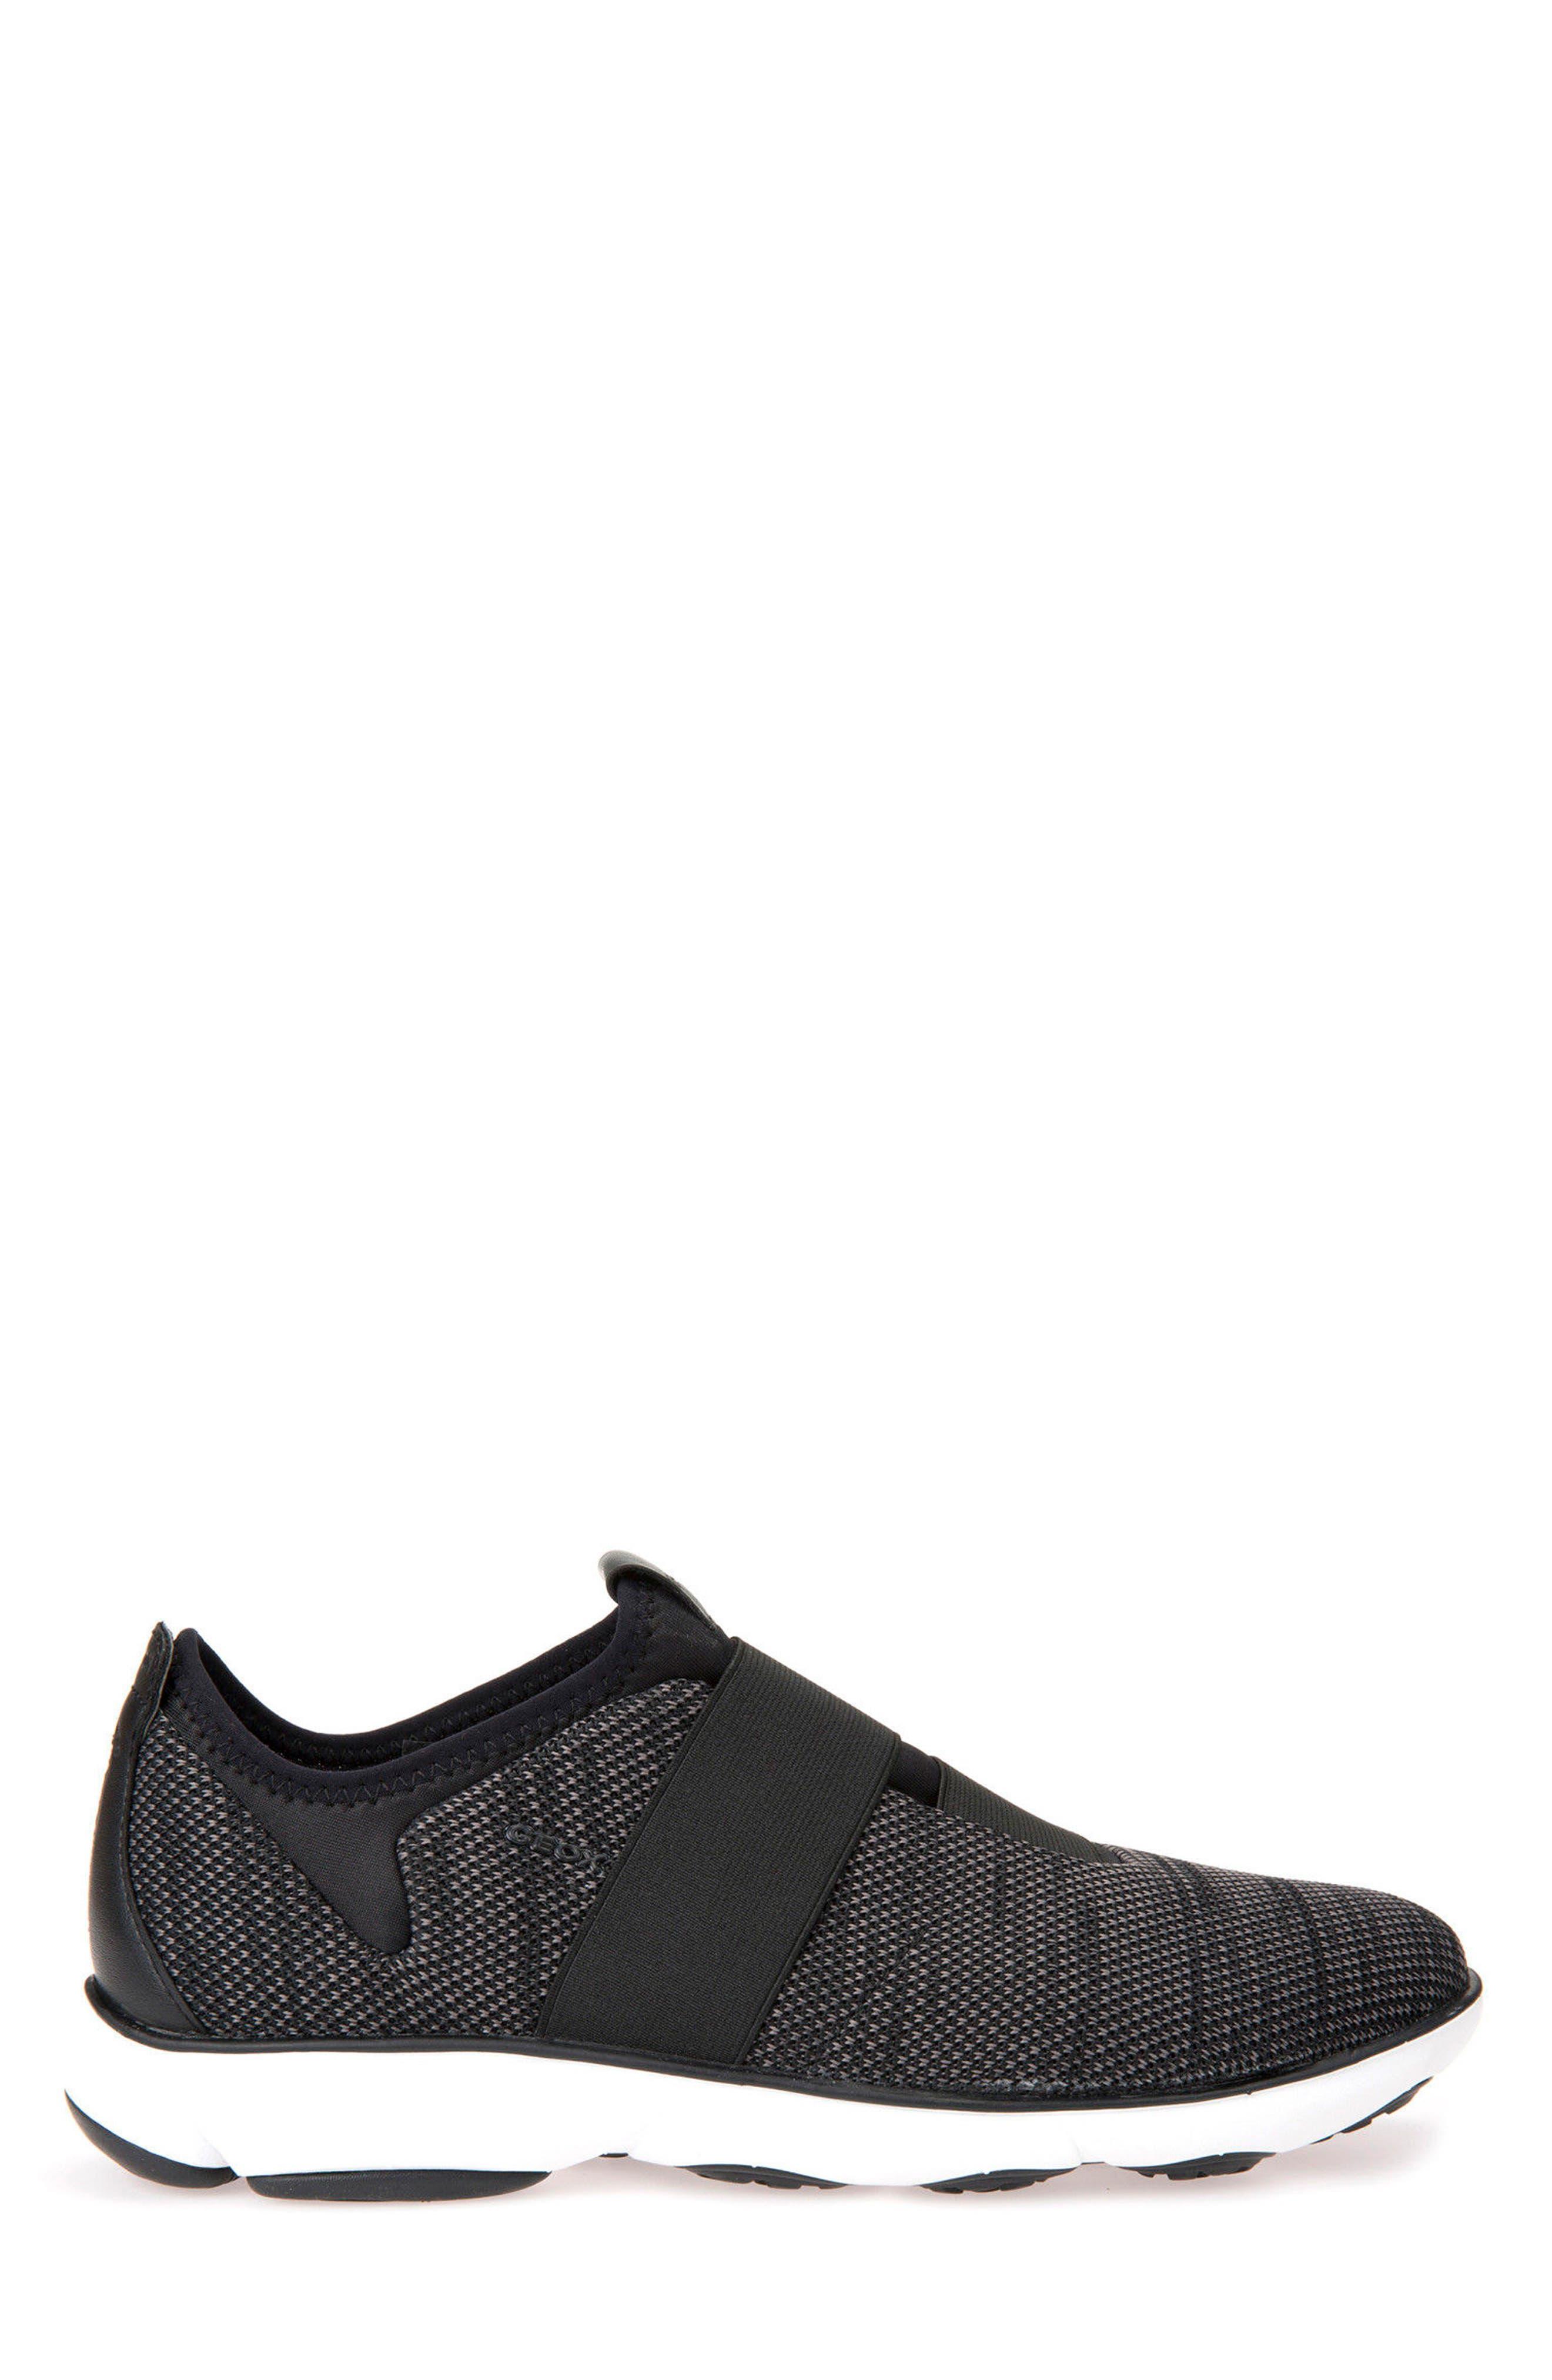 Nebula 45 Banded Slip-On Sneaker,                         Main,                         color, BLACK